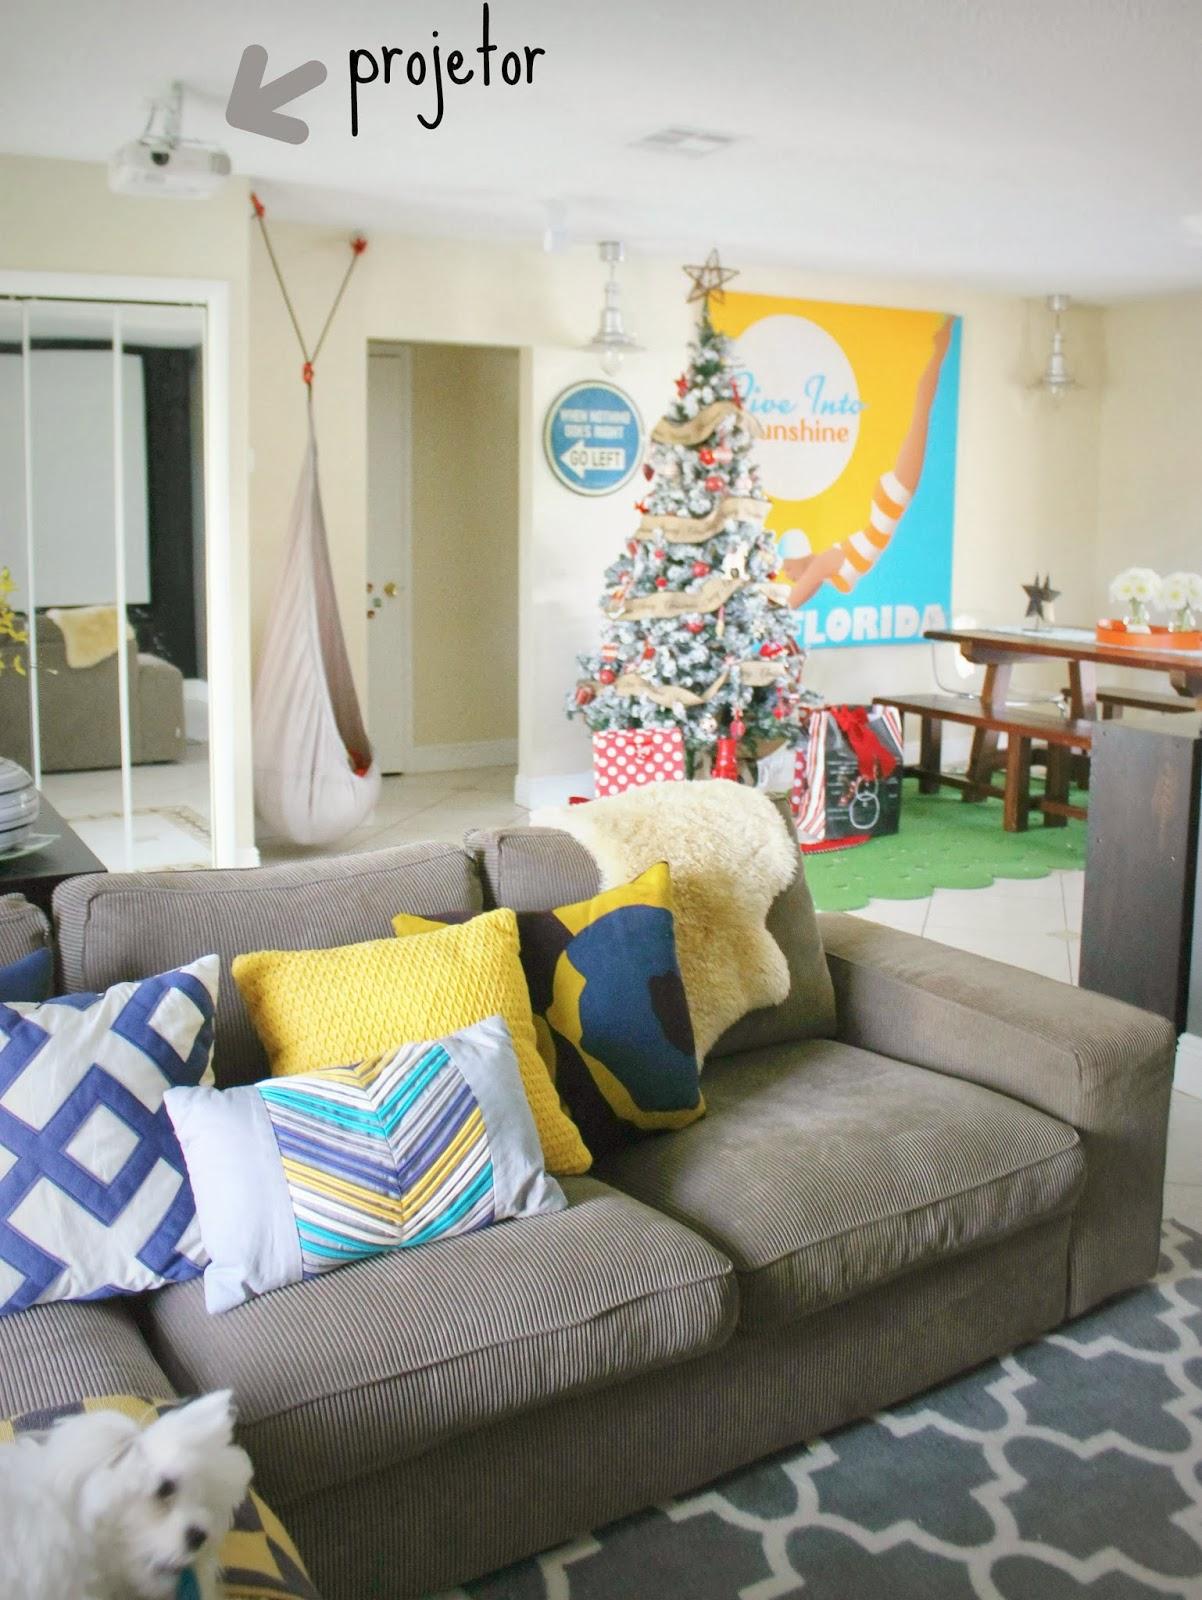 sofa cinza e almofadas coloridas bed turns into bunk beds casa montada cinema em